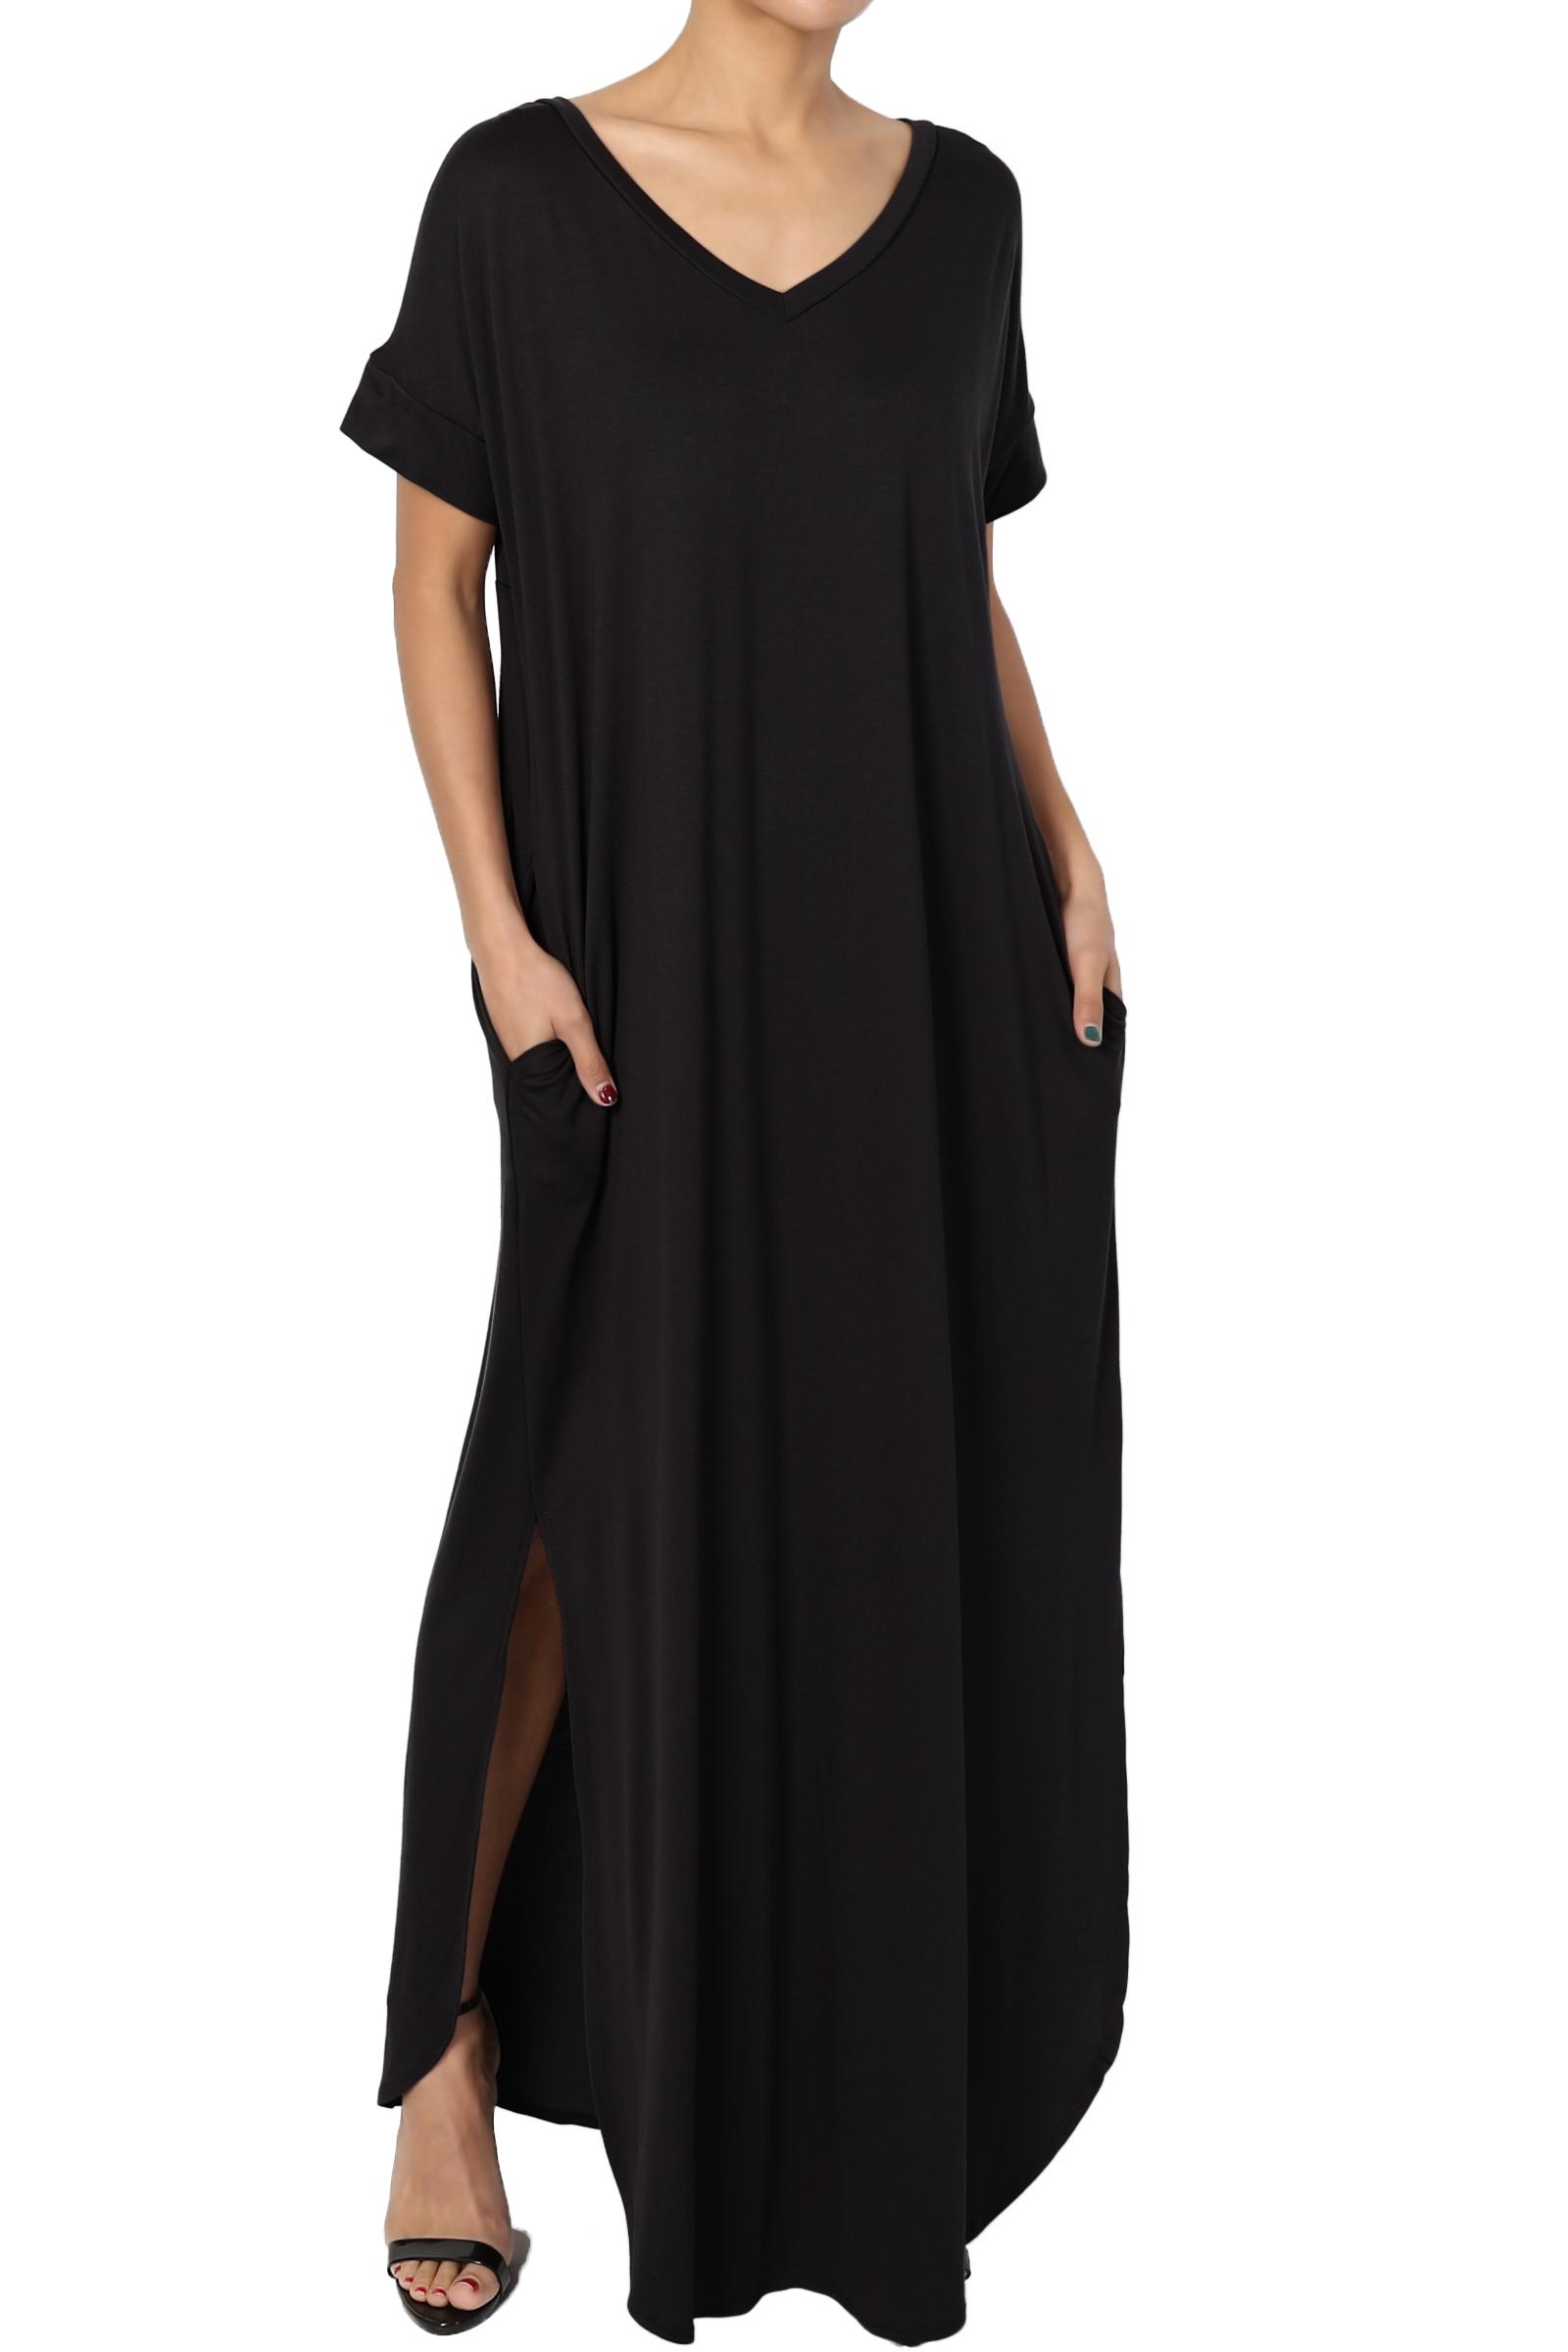 TheMogan Women's PLUS Viscose Jersey V-Neck Short Sleeve Relaxed T-Shirt Maxi Dress